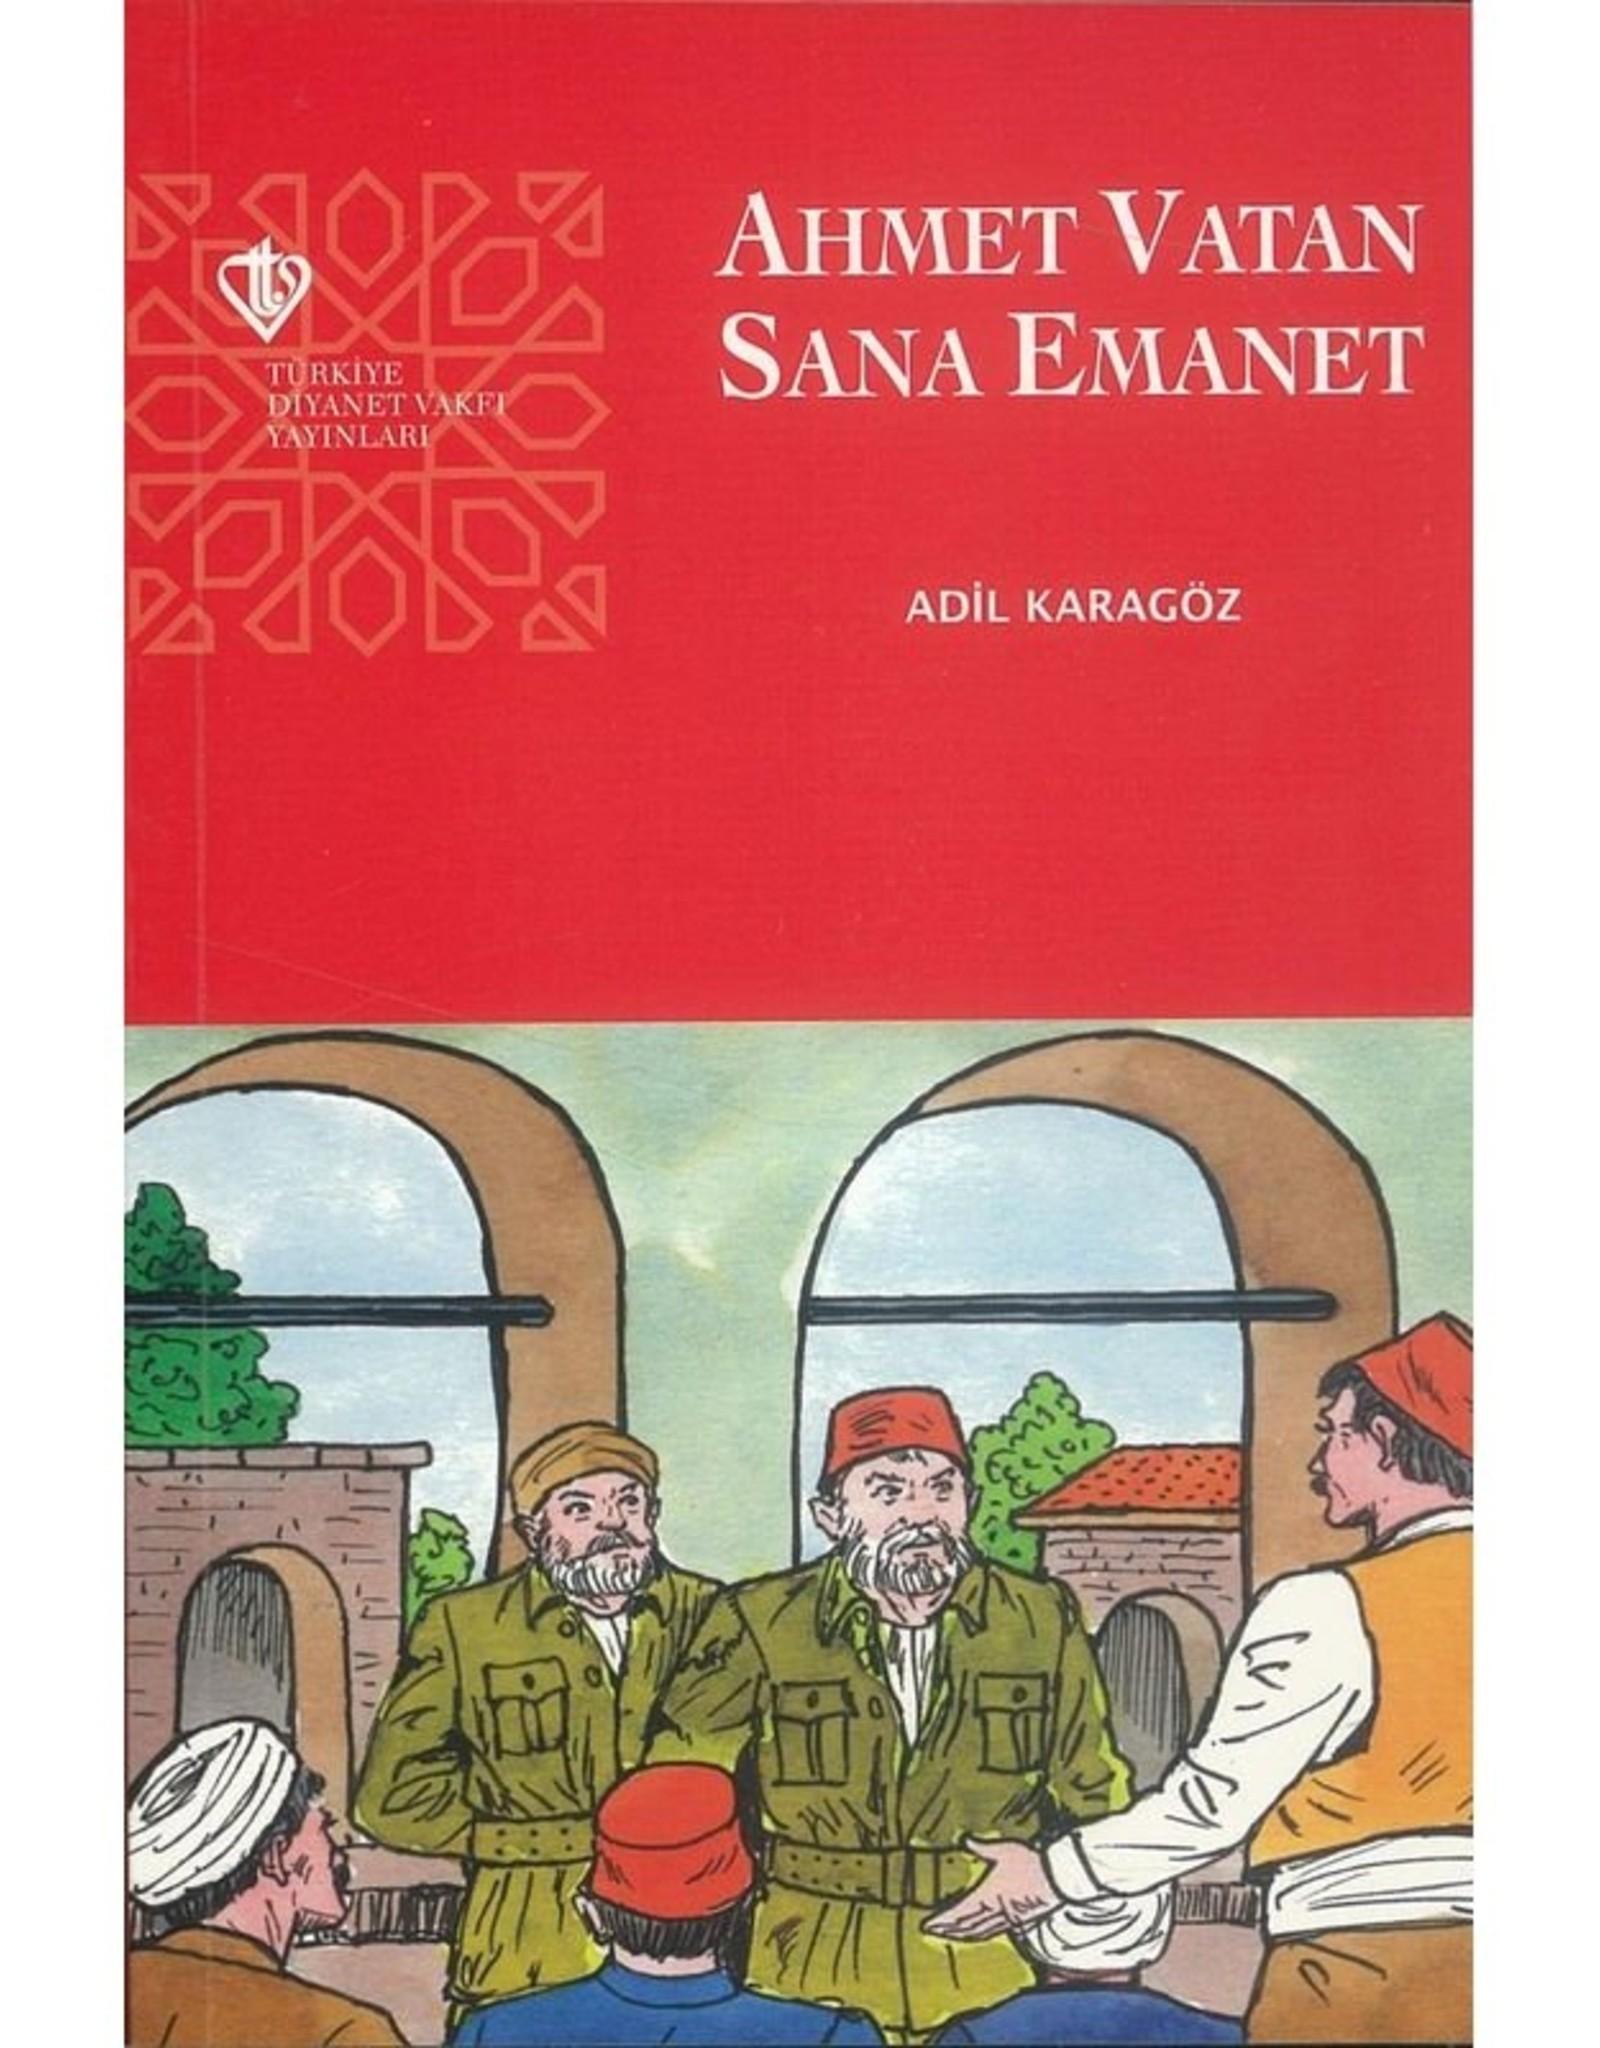 Ahmet Vatan Sana Emanet